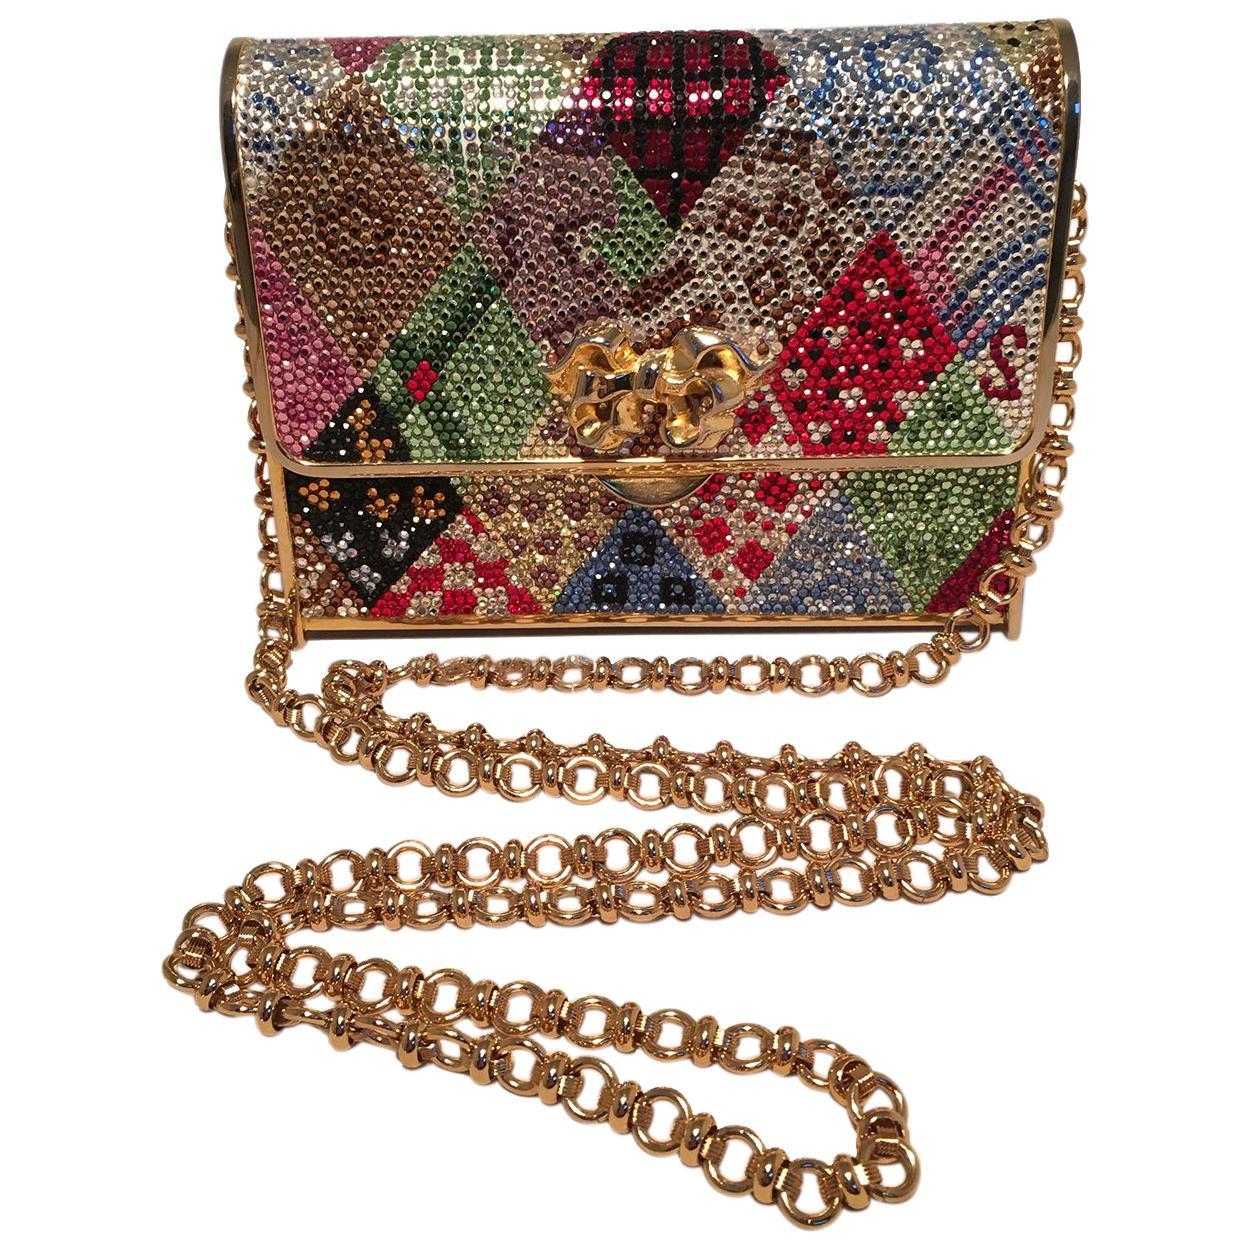 Judith Leiber Multicolor Swarovski Crystal Top Flap Box Minaudiere Evening Bag